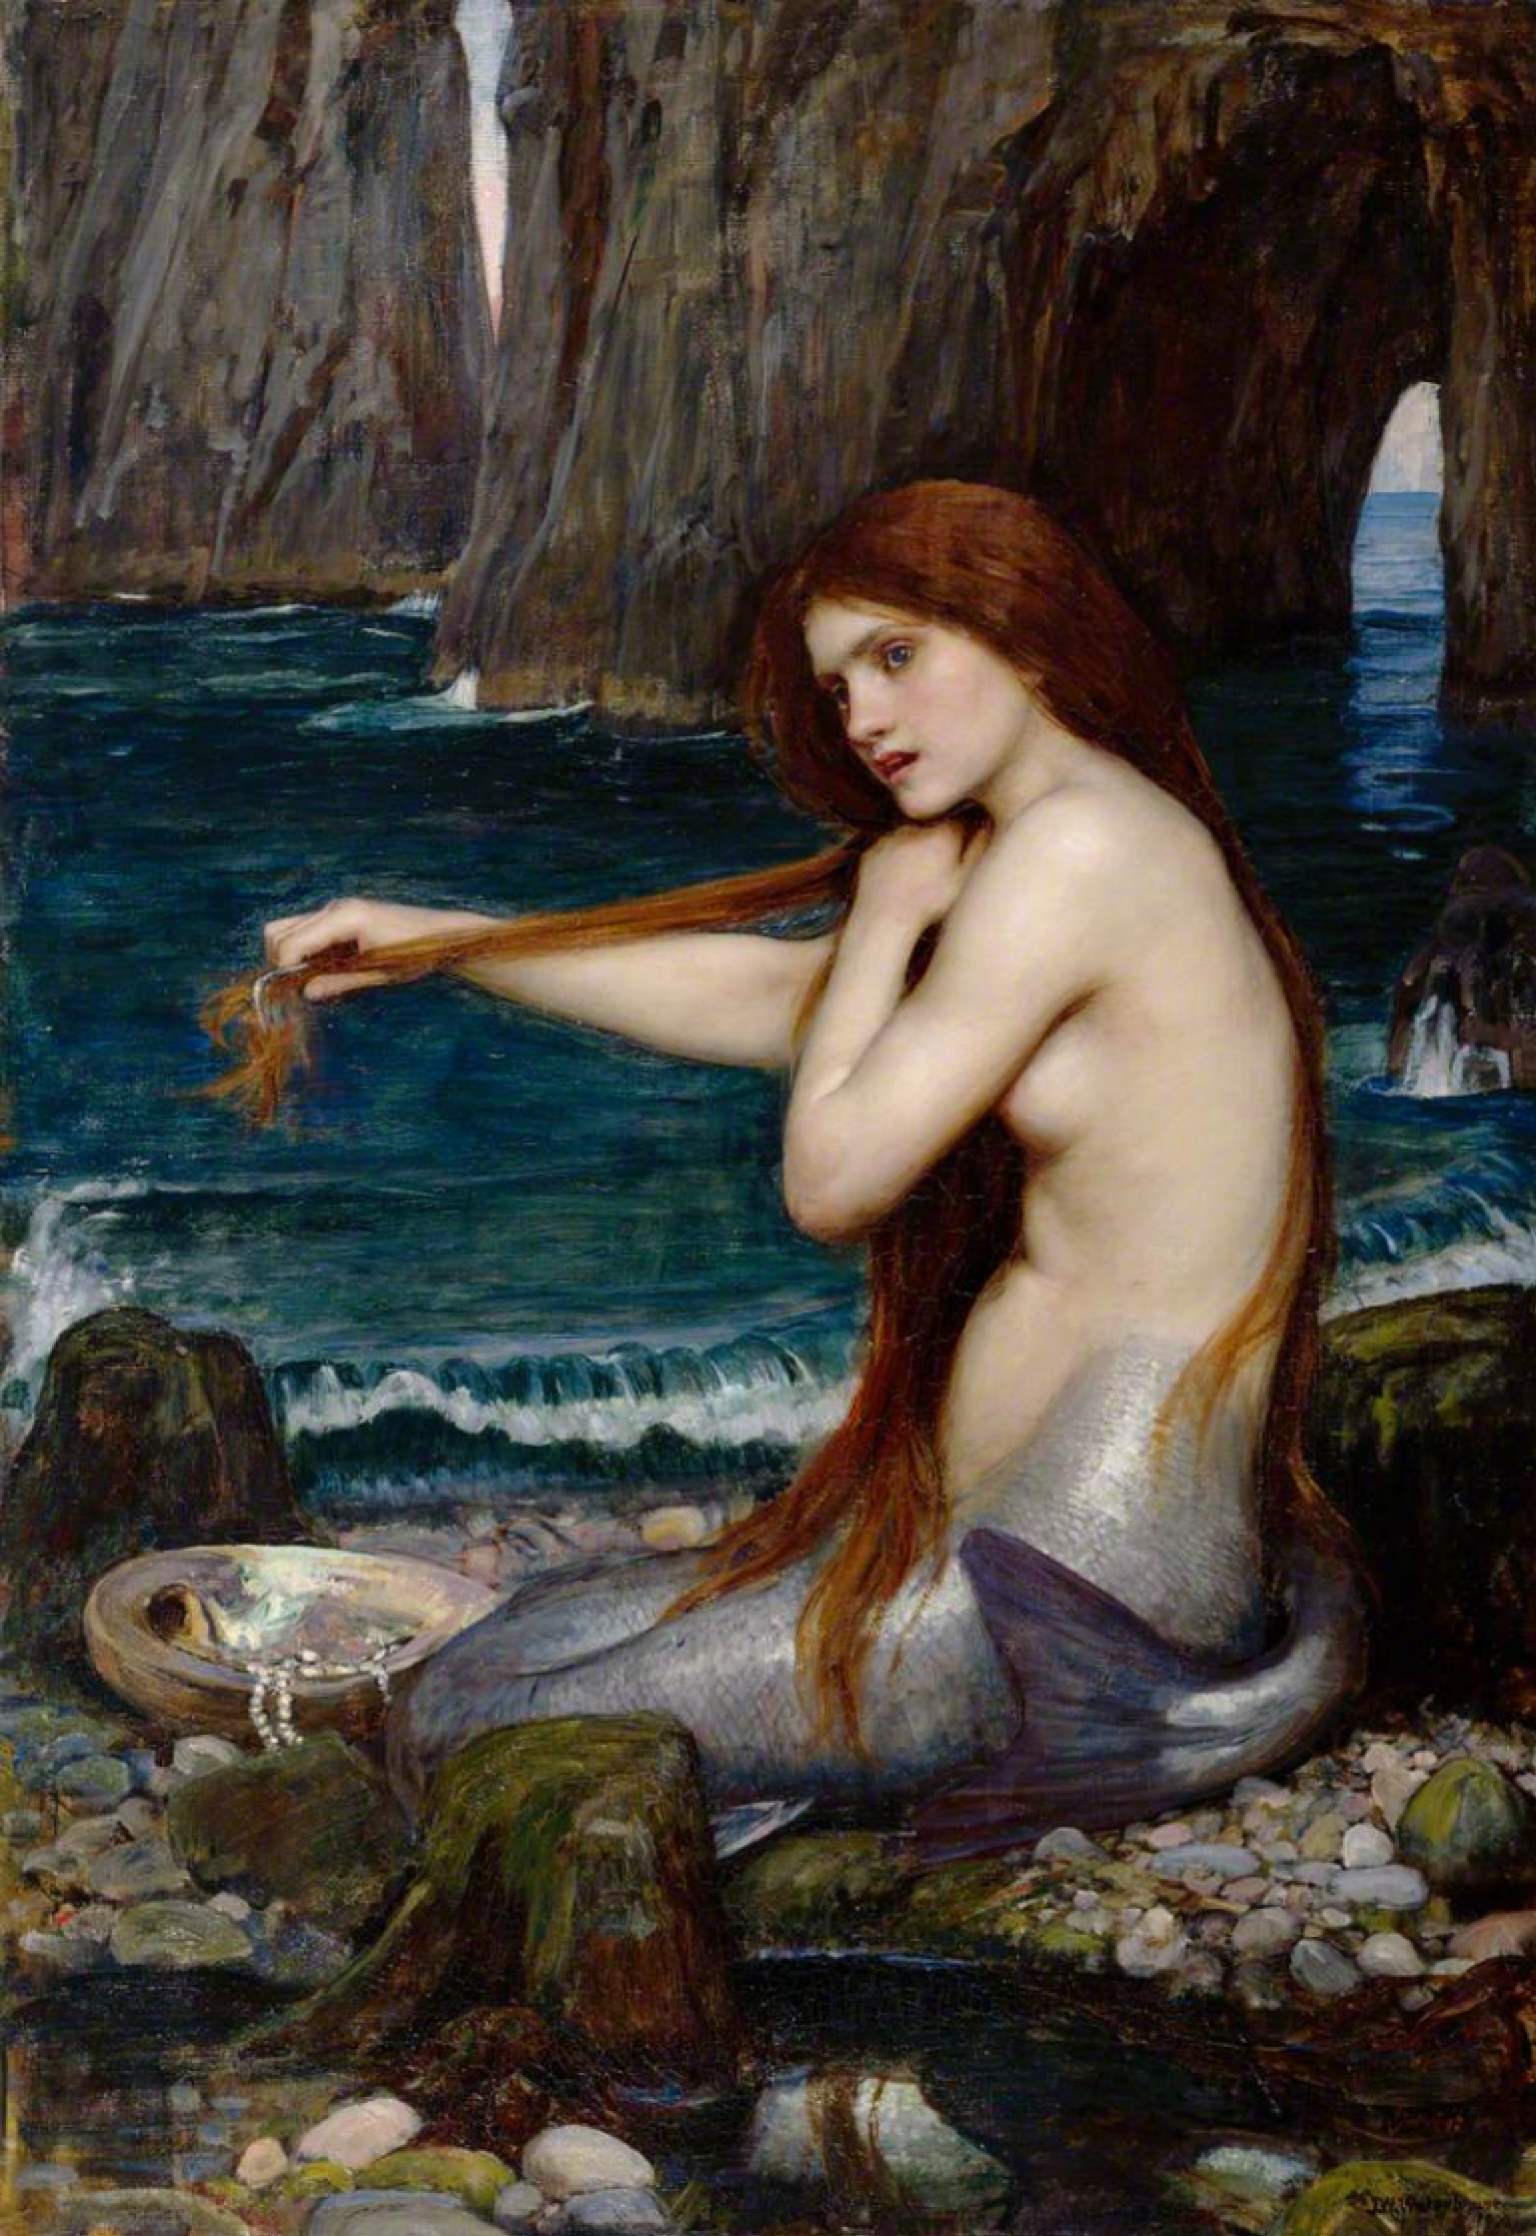 John William Waterhouse. Mermaid